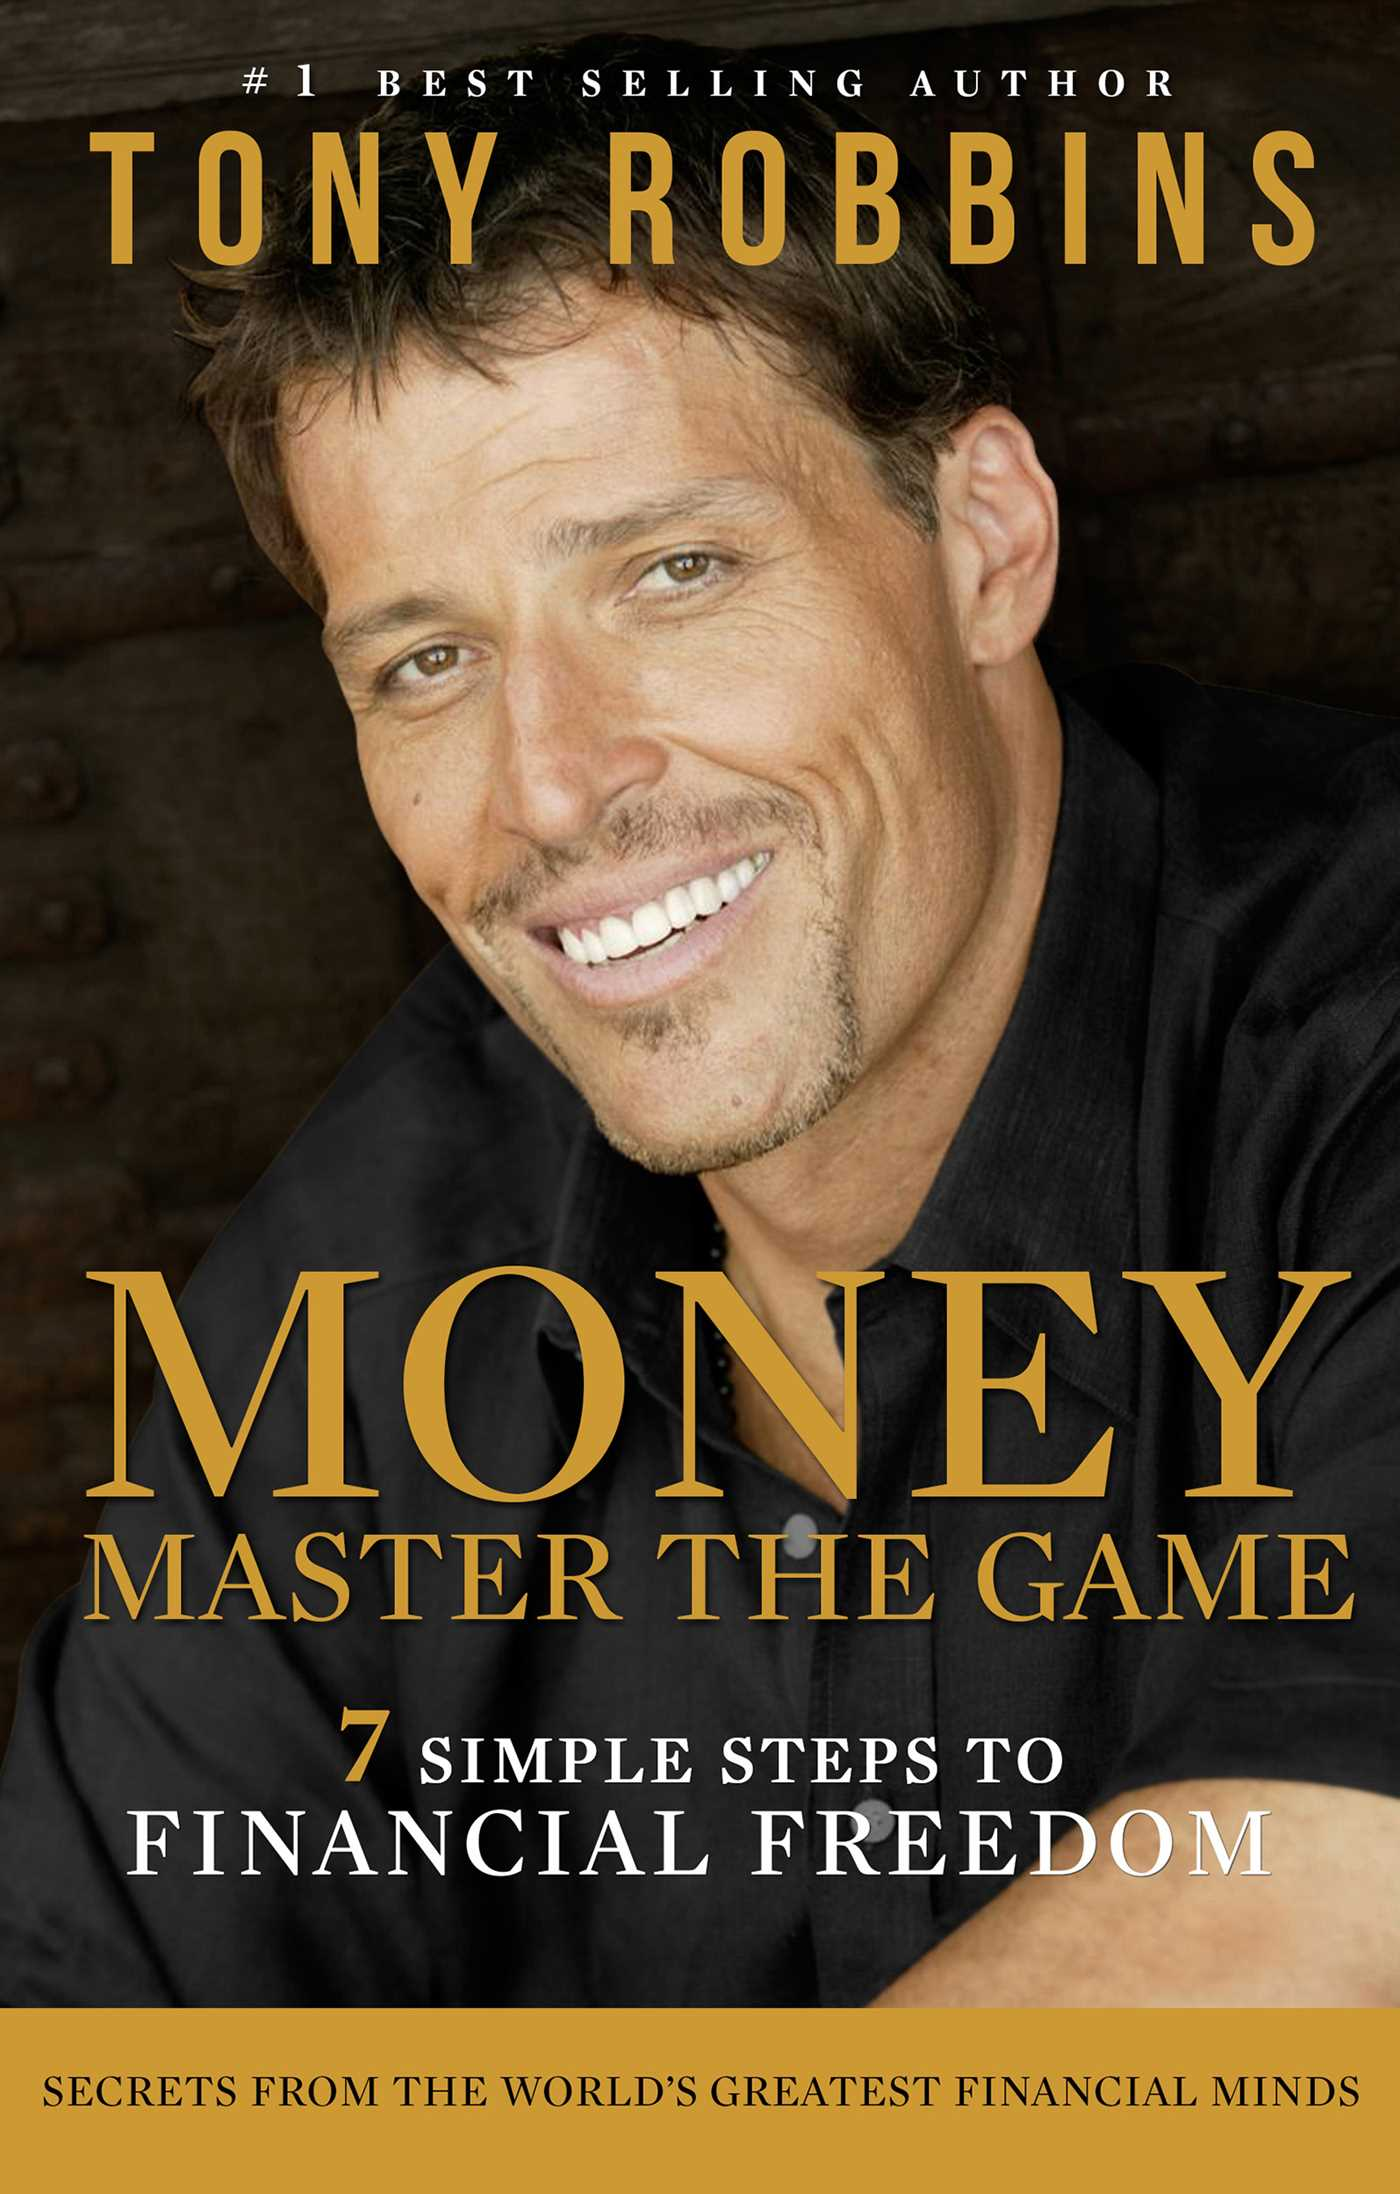 Money master the game 9781471148620 hr